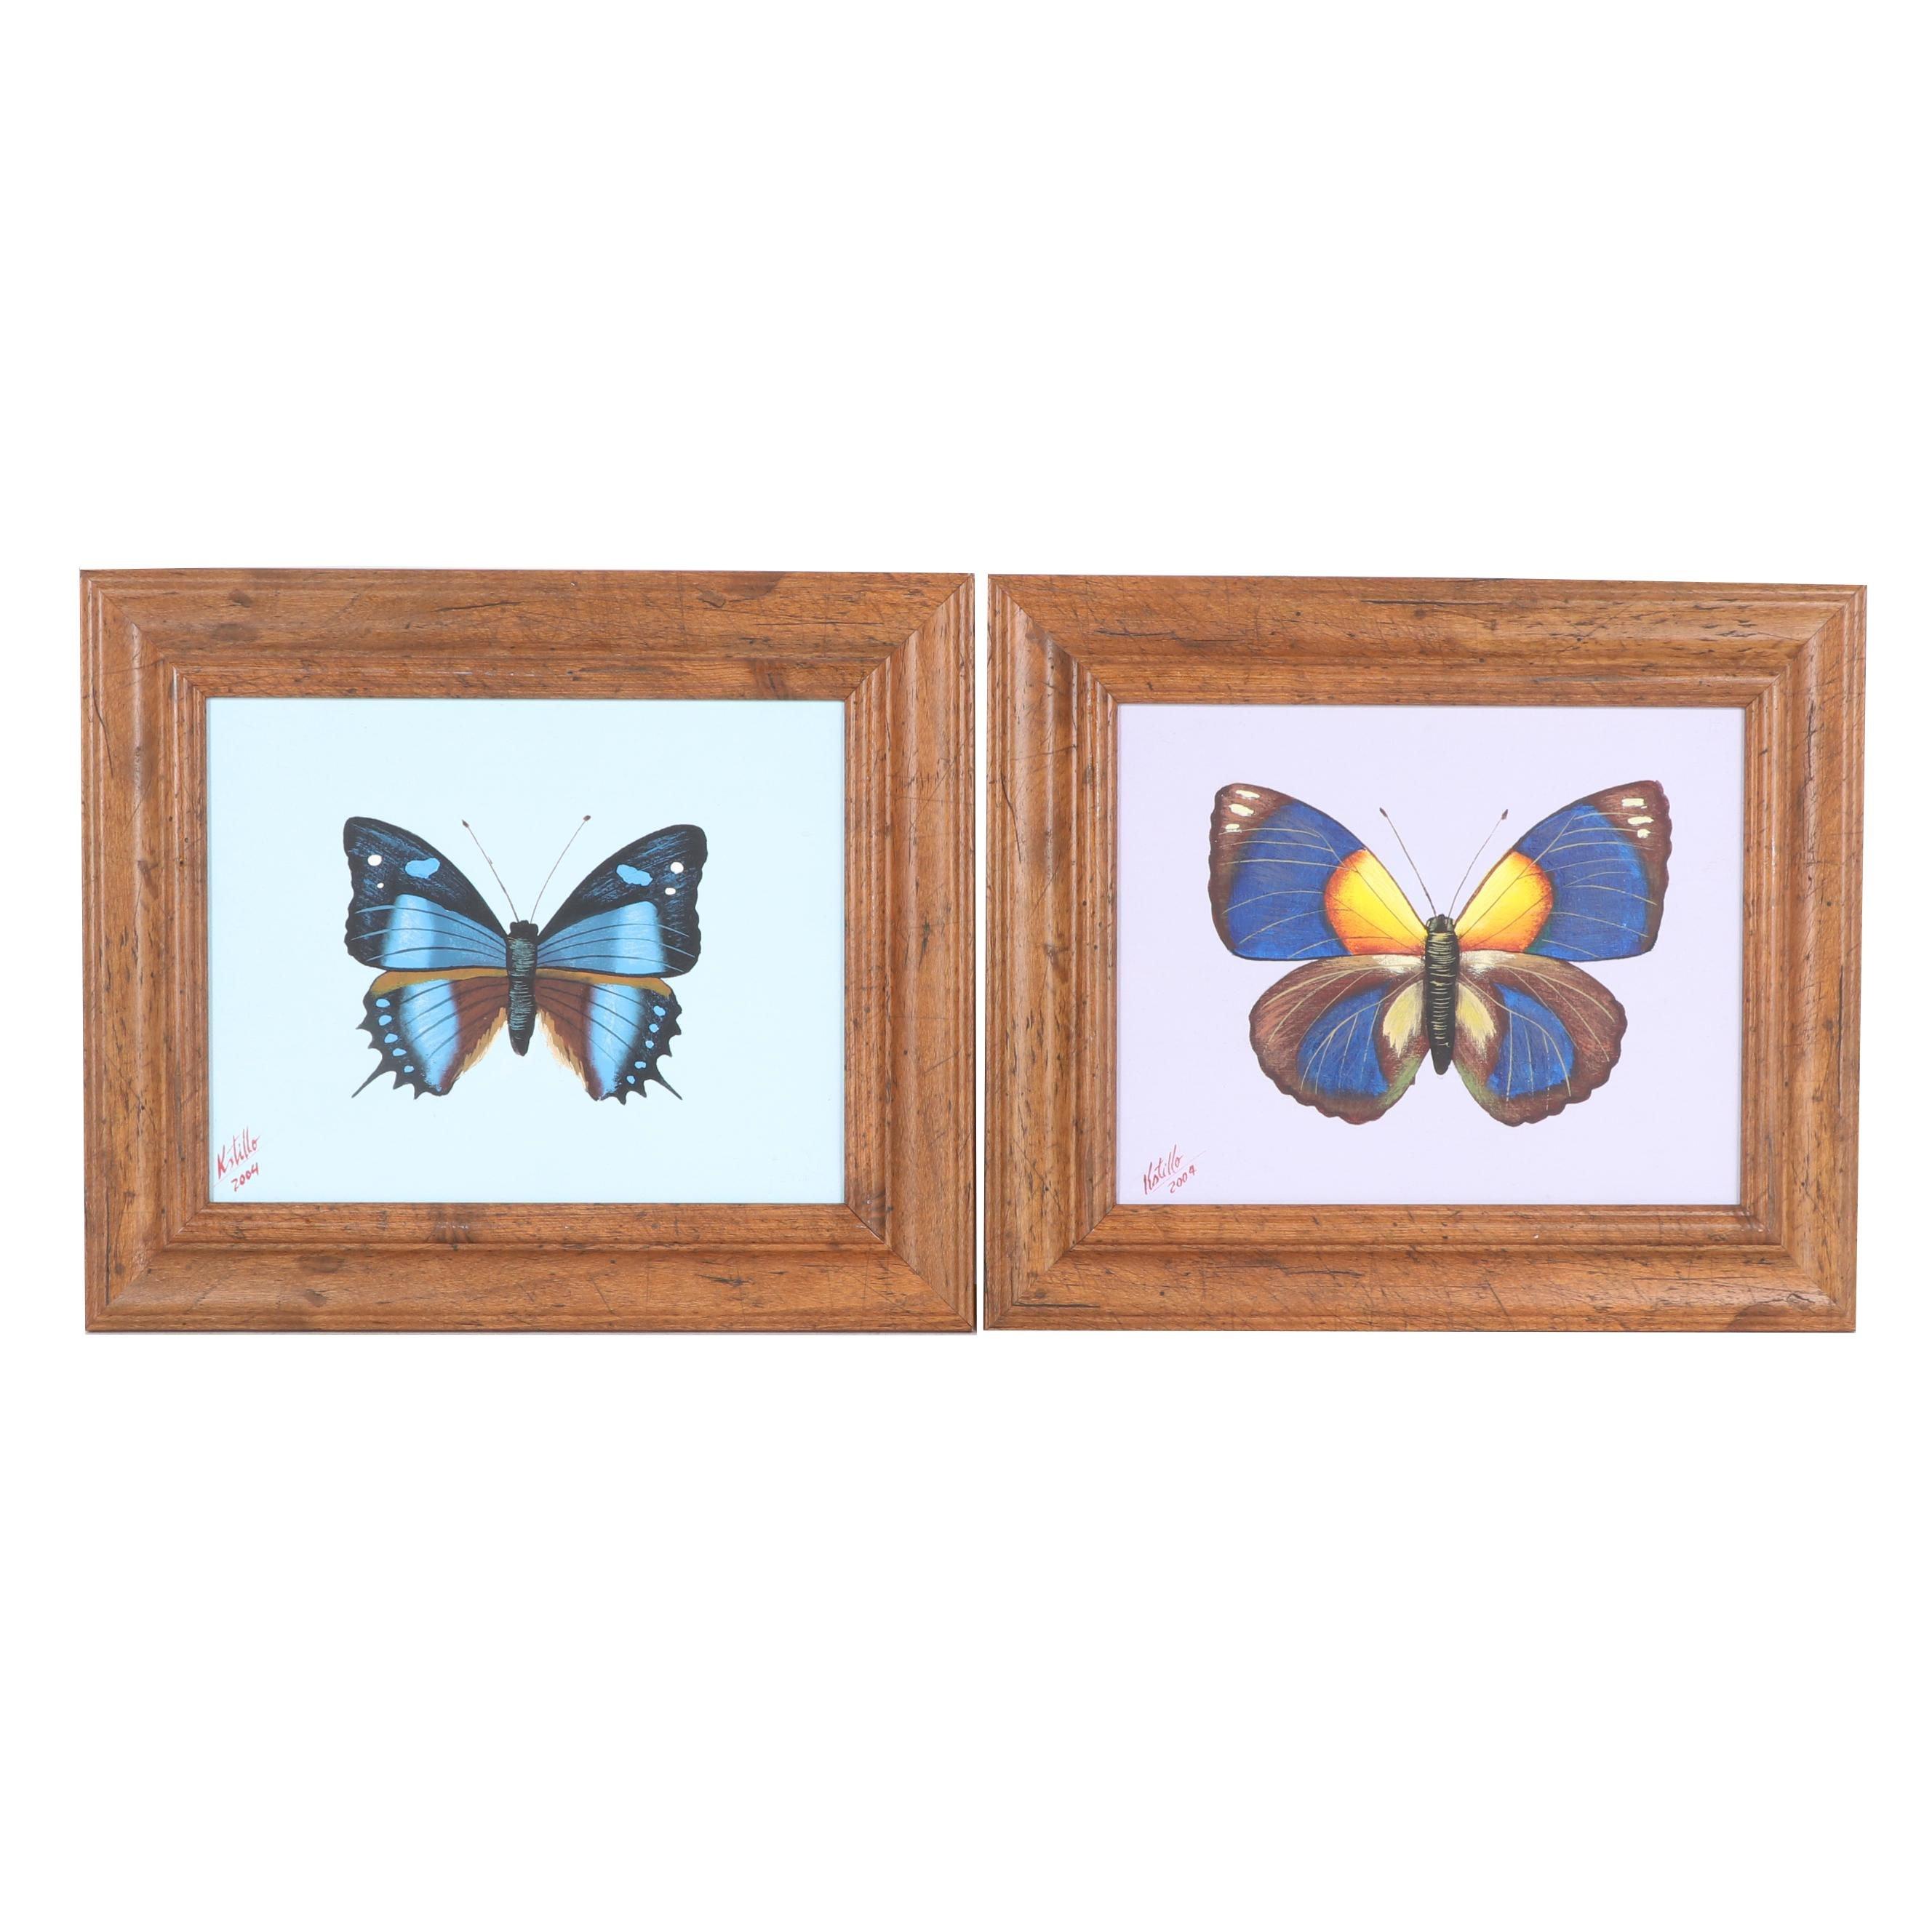 Kstillo Oil Paintings of Butterflies